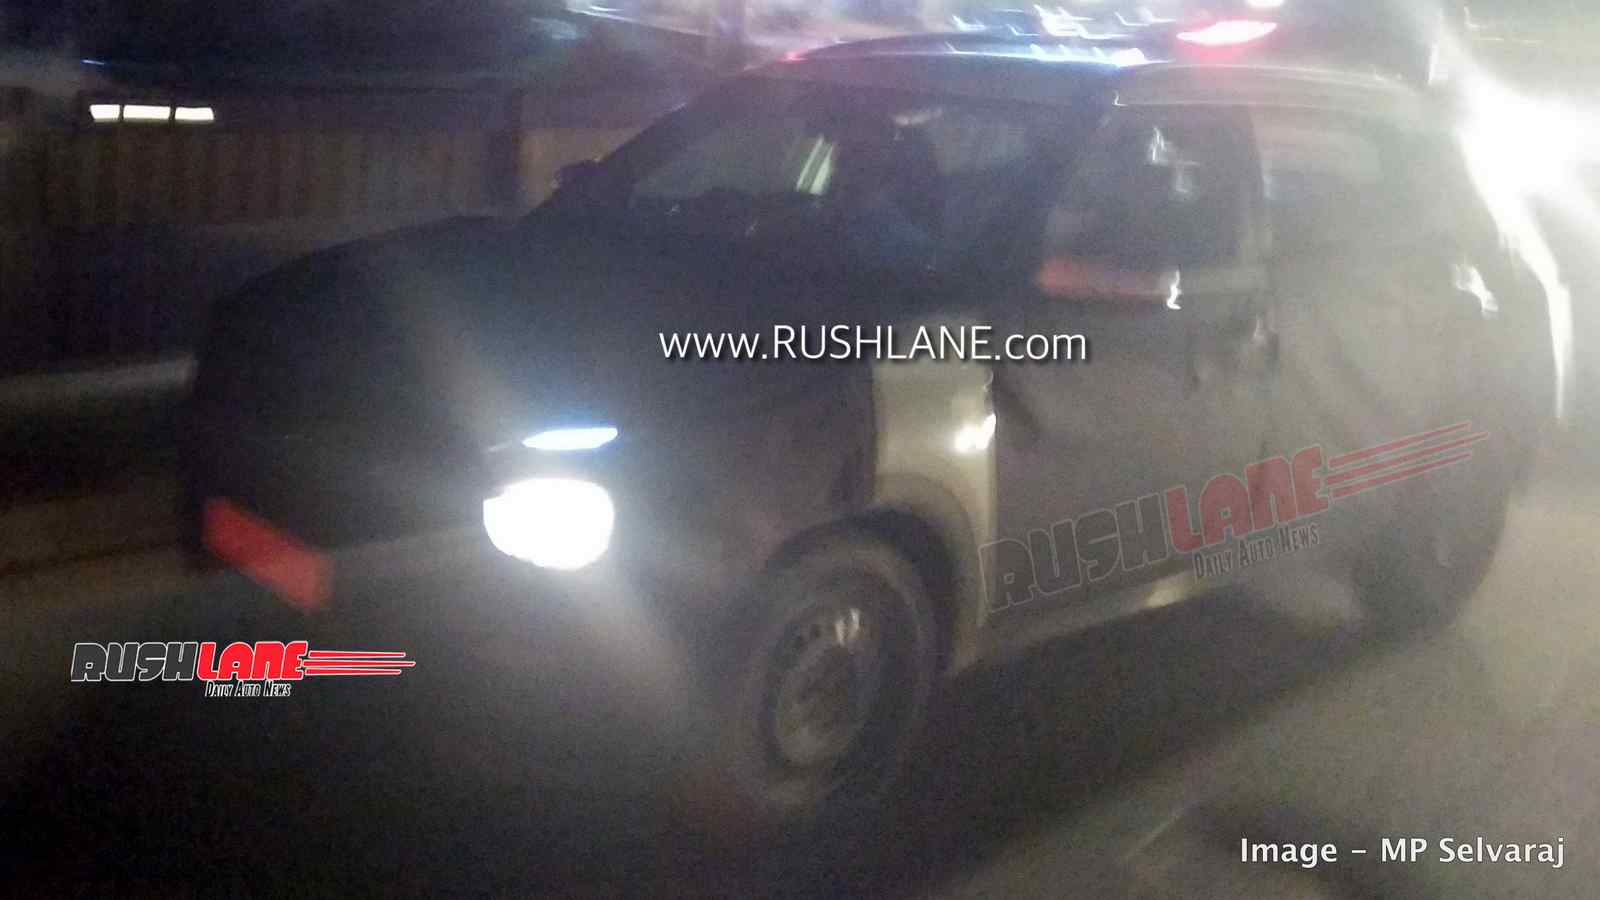 2020 Hyundai Creta spied at night – LED headlight and DRL revealed